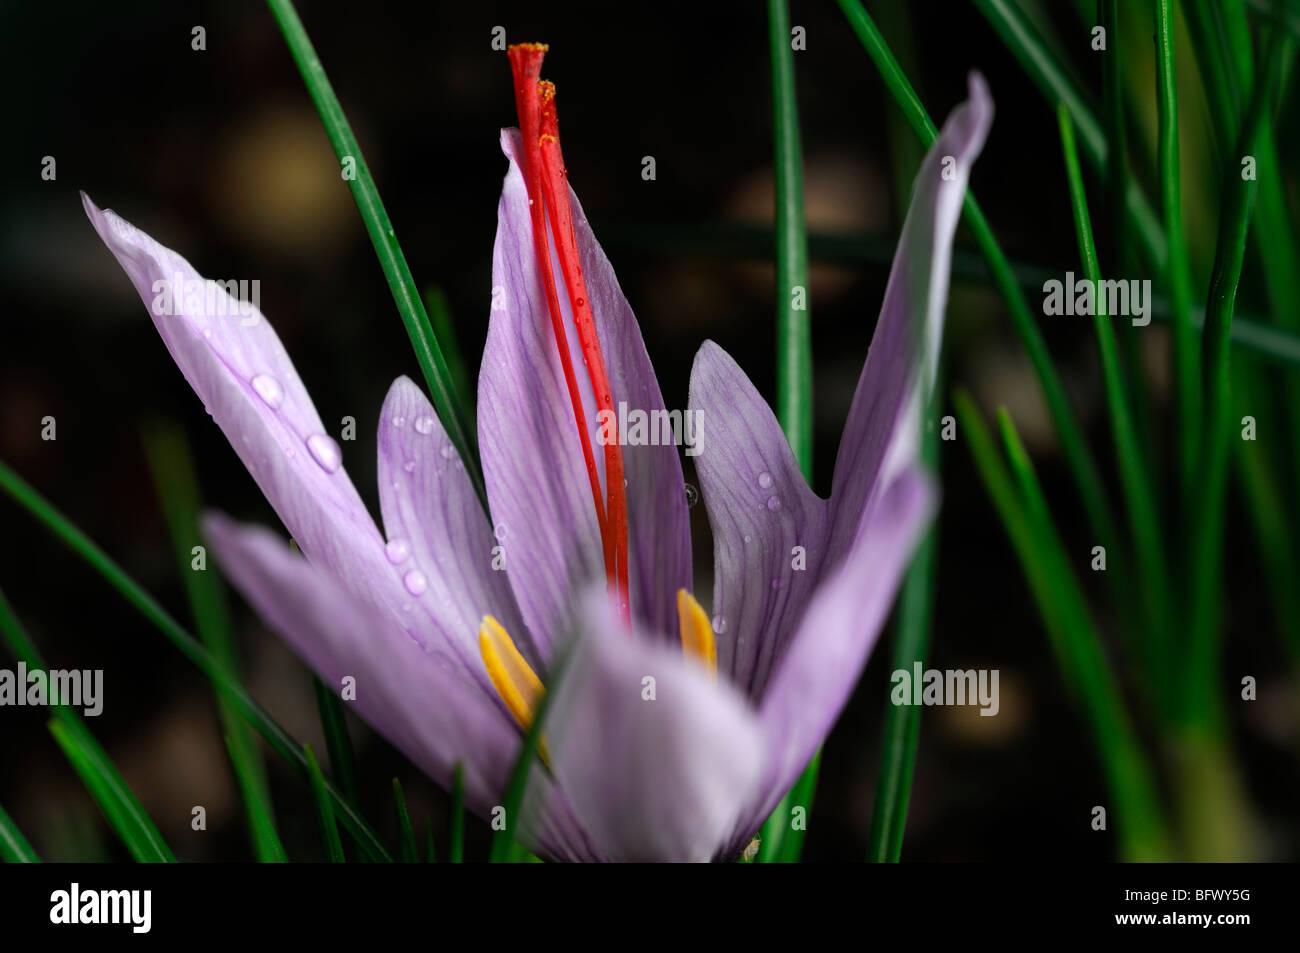 Crocus sativus Autumn Crocus Saffron flower single one open bloom blossom purple red stamen - Stock Image